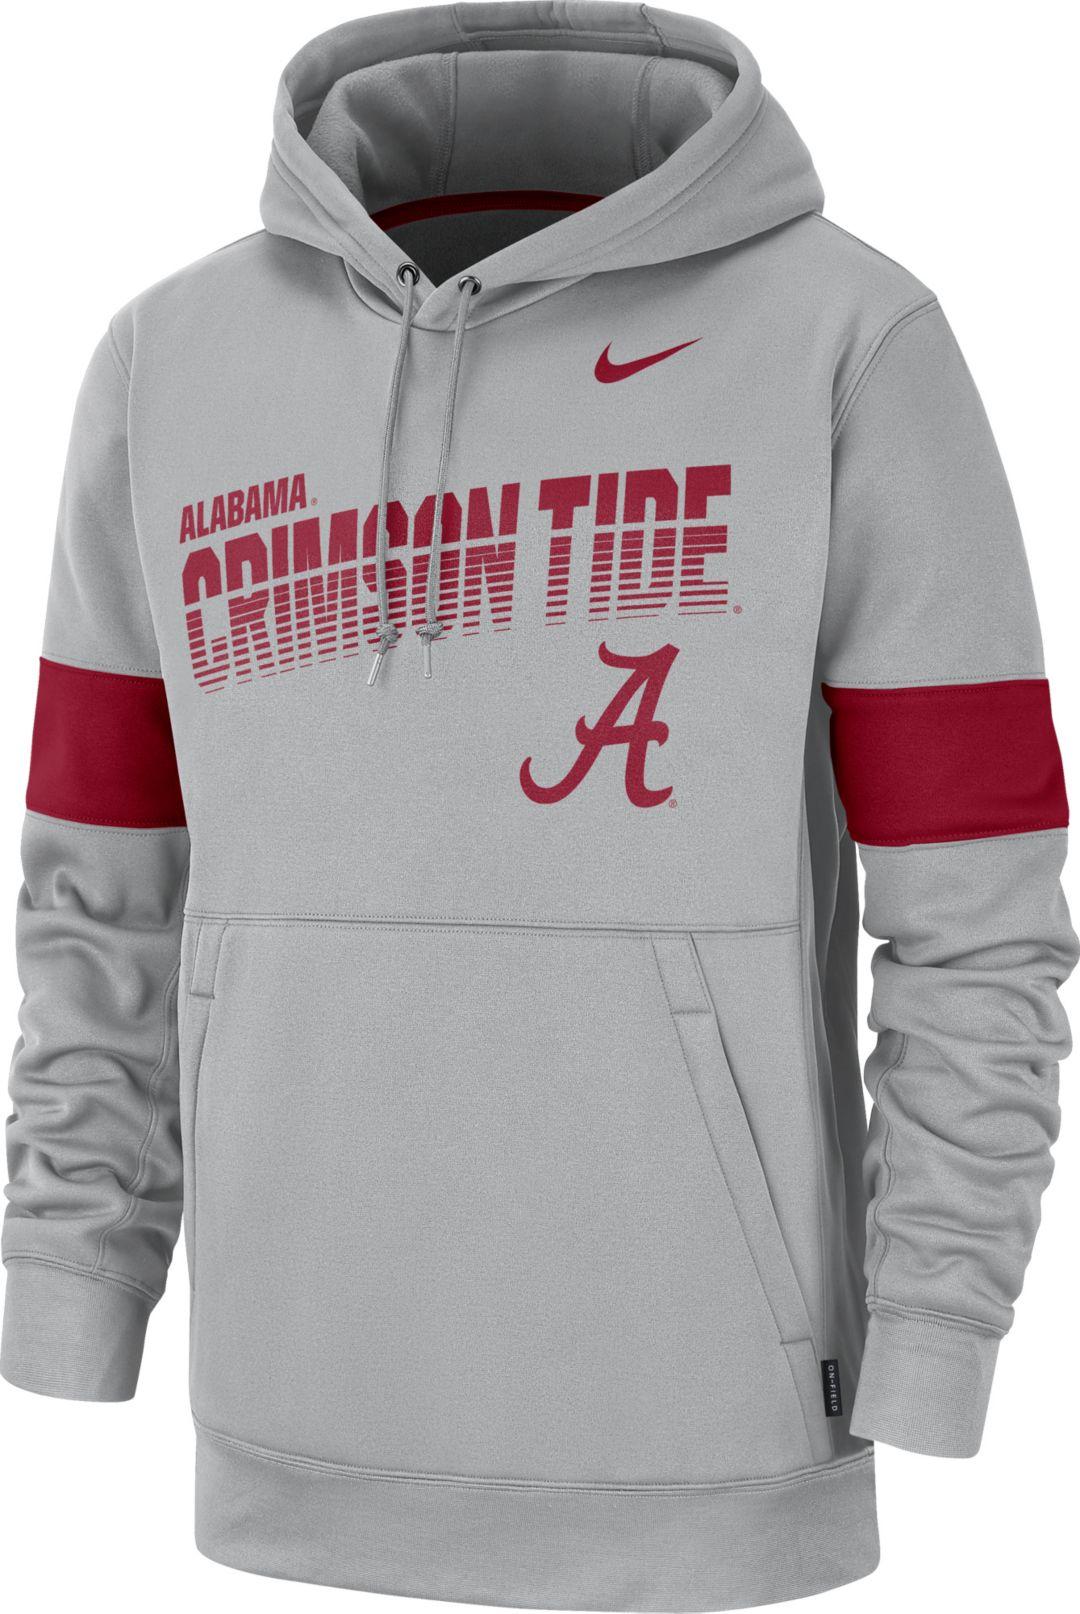 super popular 01eaa e0b39 Nike Men's Alabama Crimson Tide Grey Therma Football Sideline Pullover  Hoodie